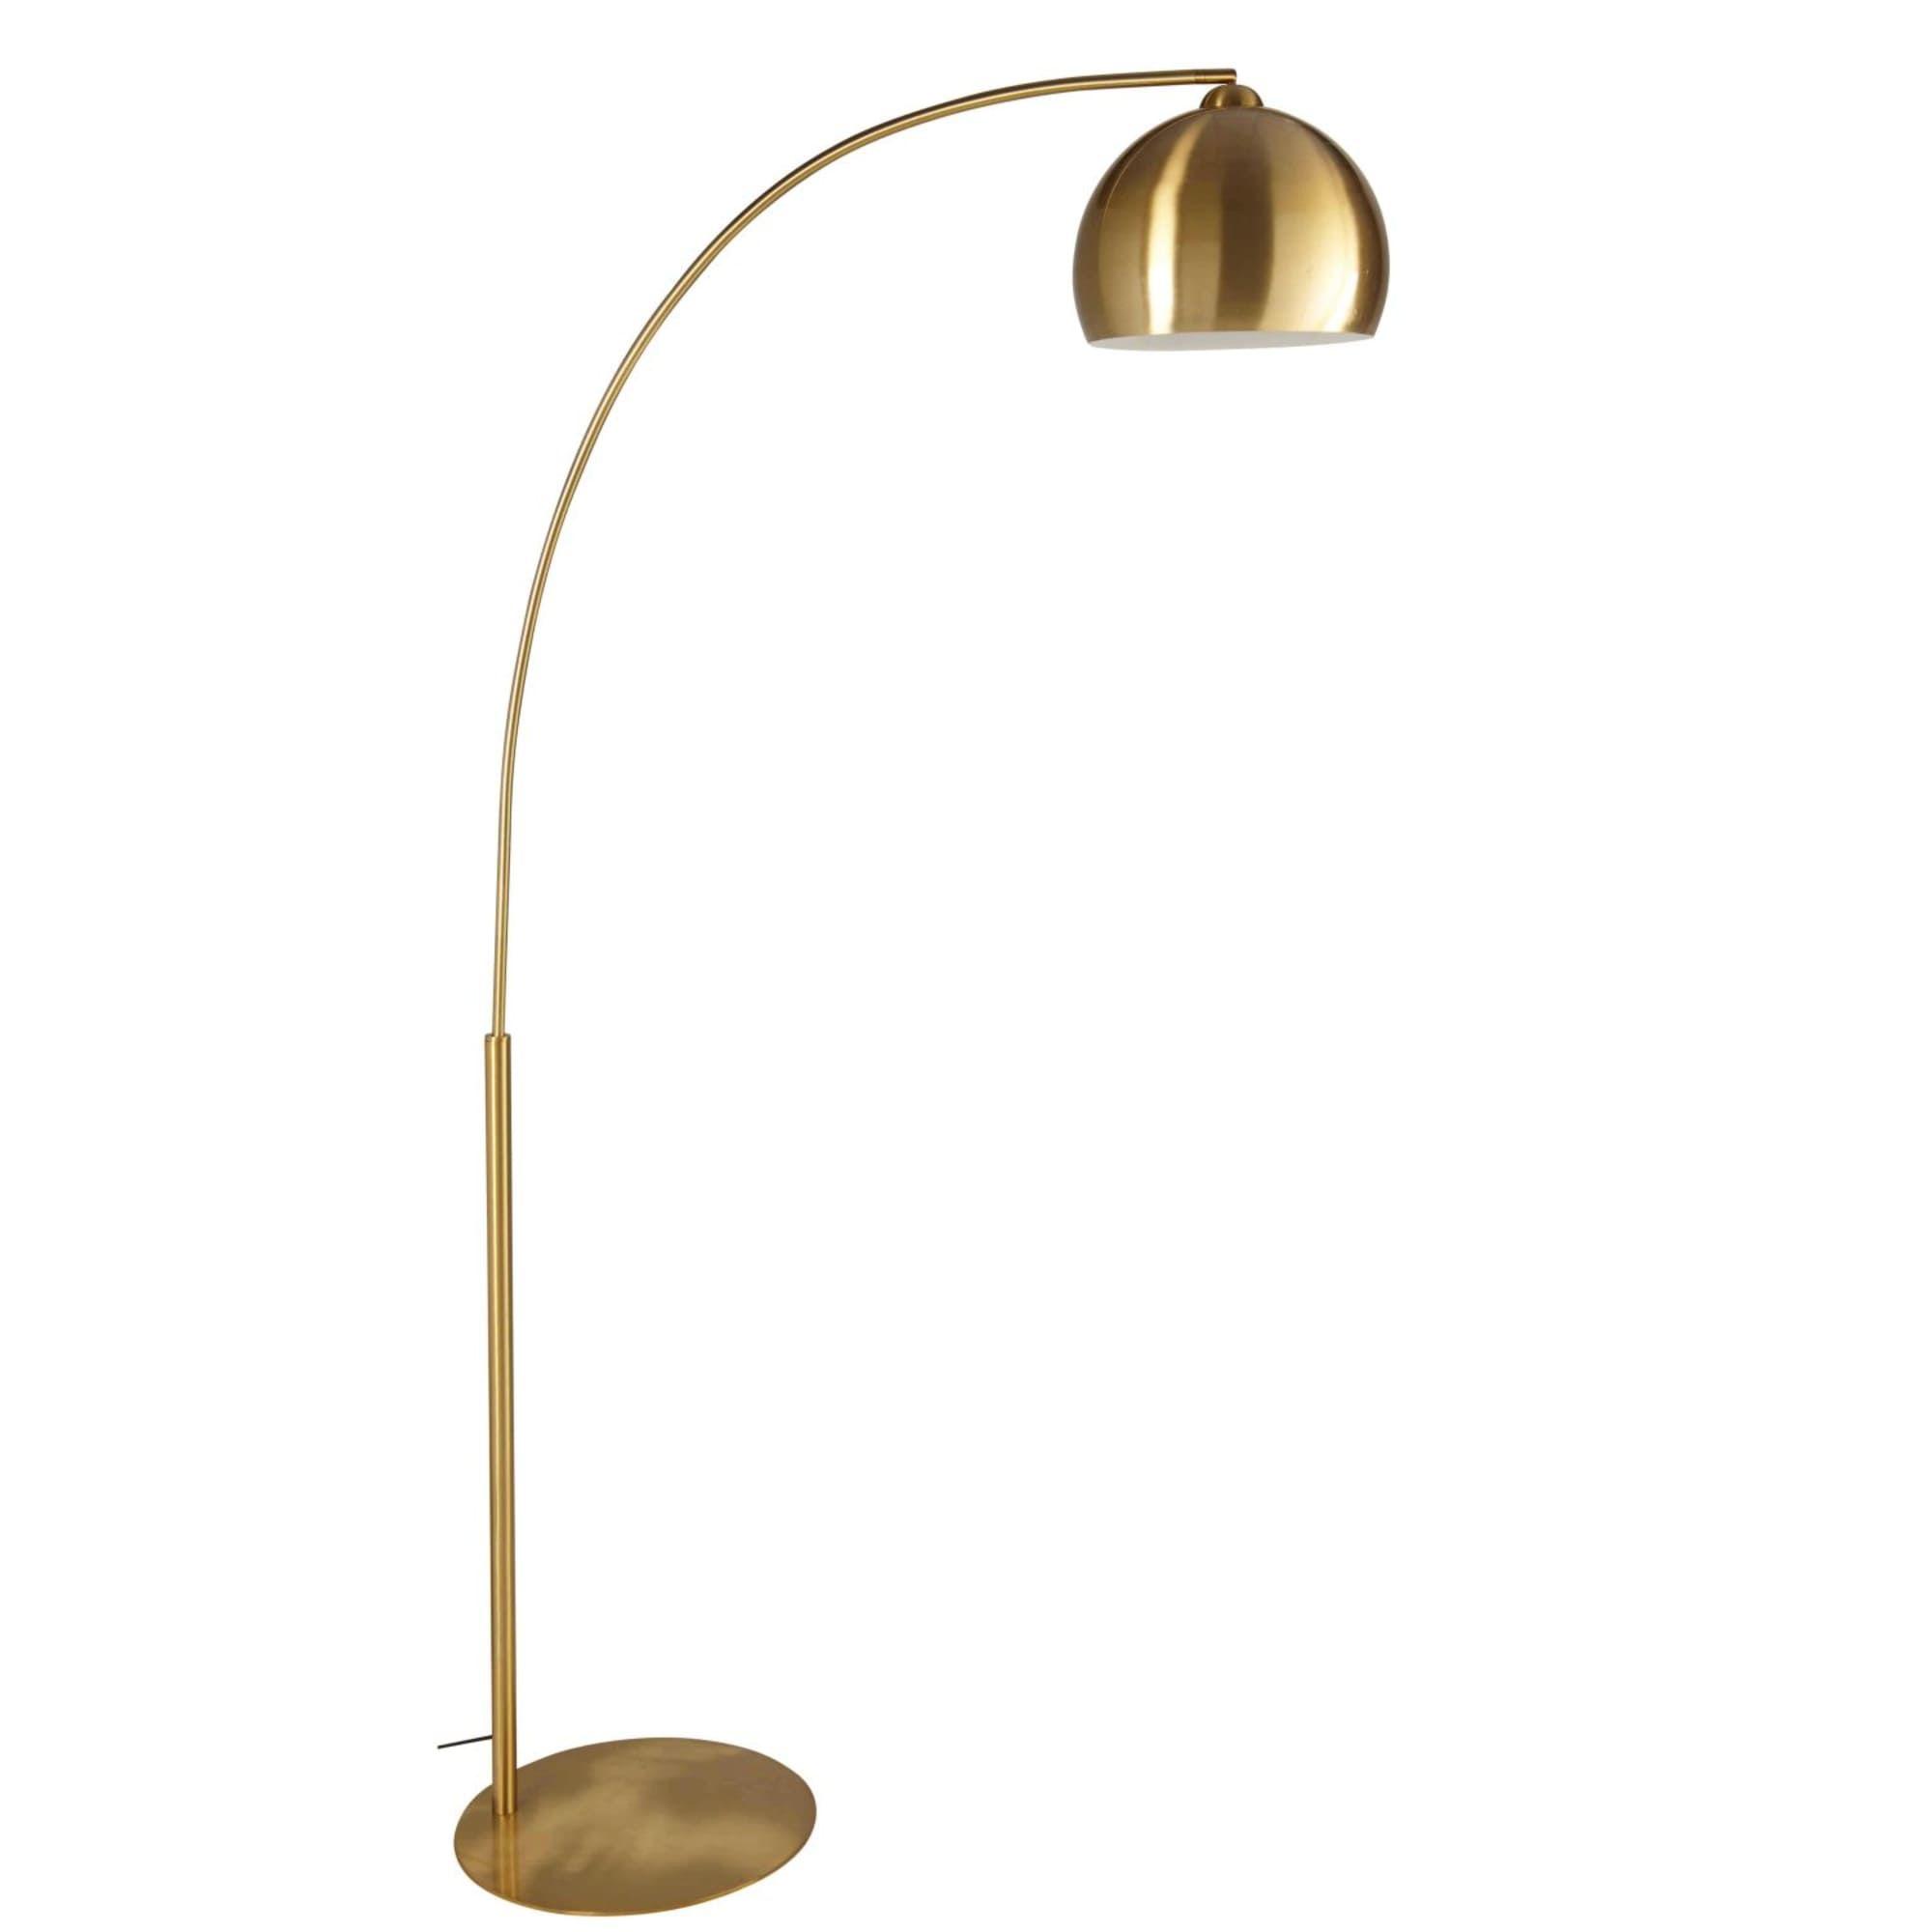 Gold Metal Floor Lamp H 206 Cm Gold Sphere Gold Floor Lamp Metal Floor Lamps Floor Lamp